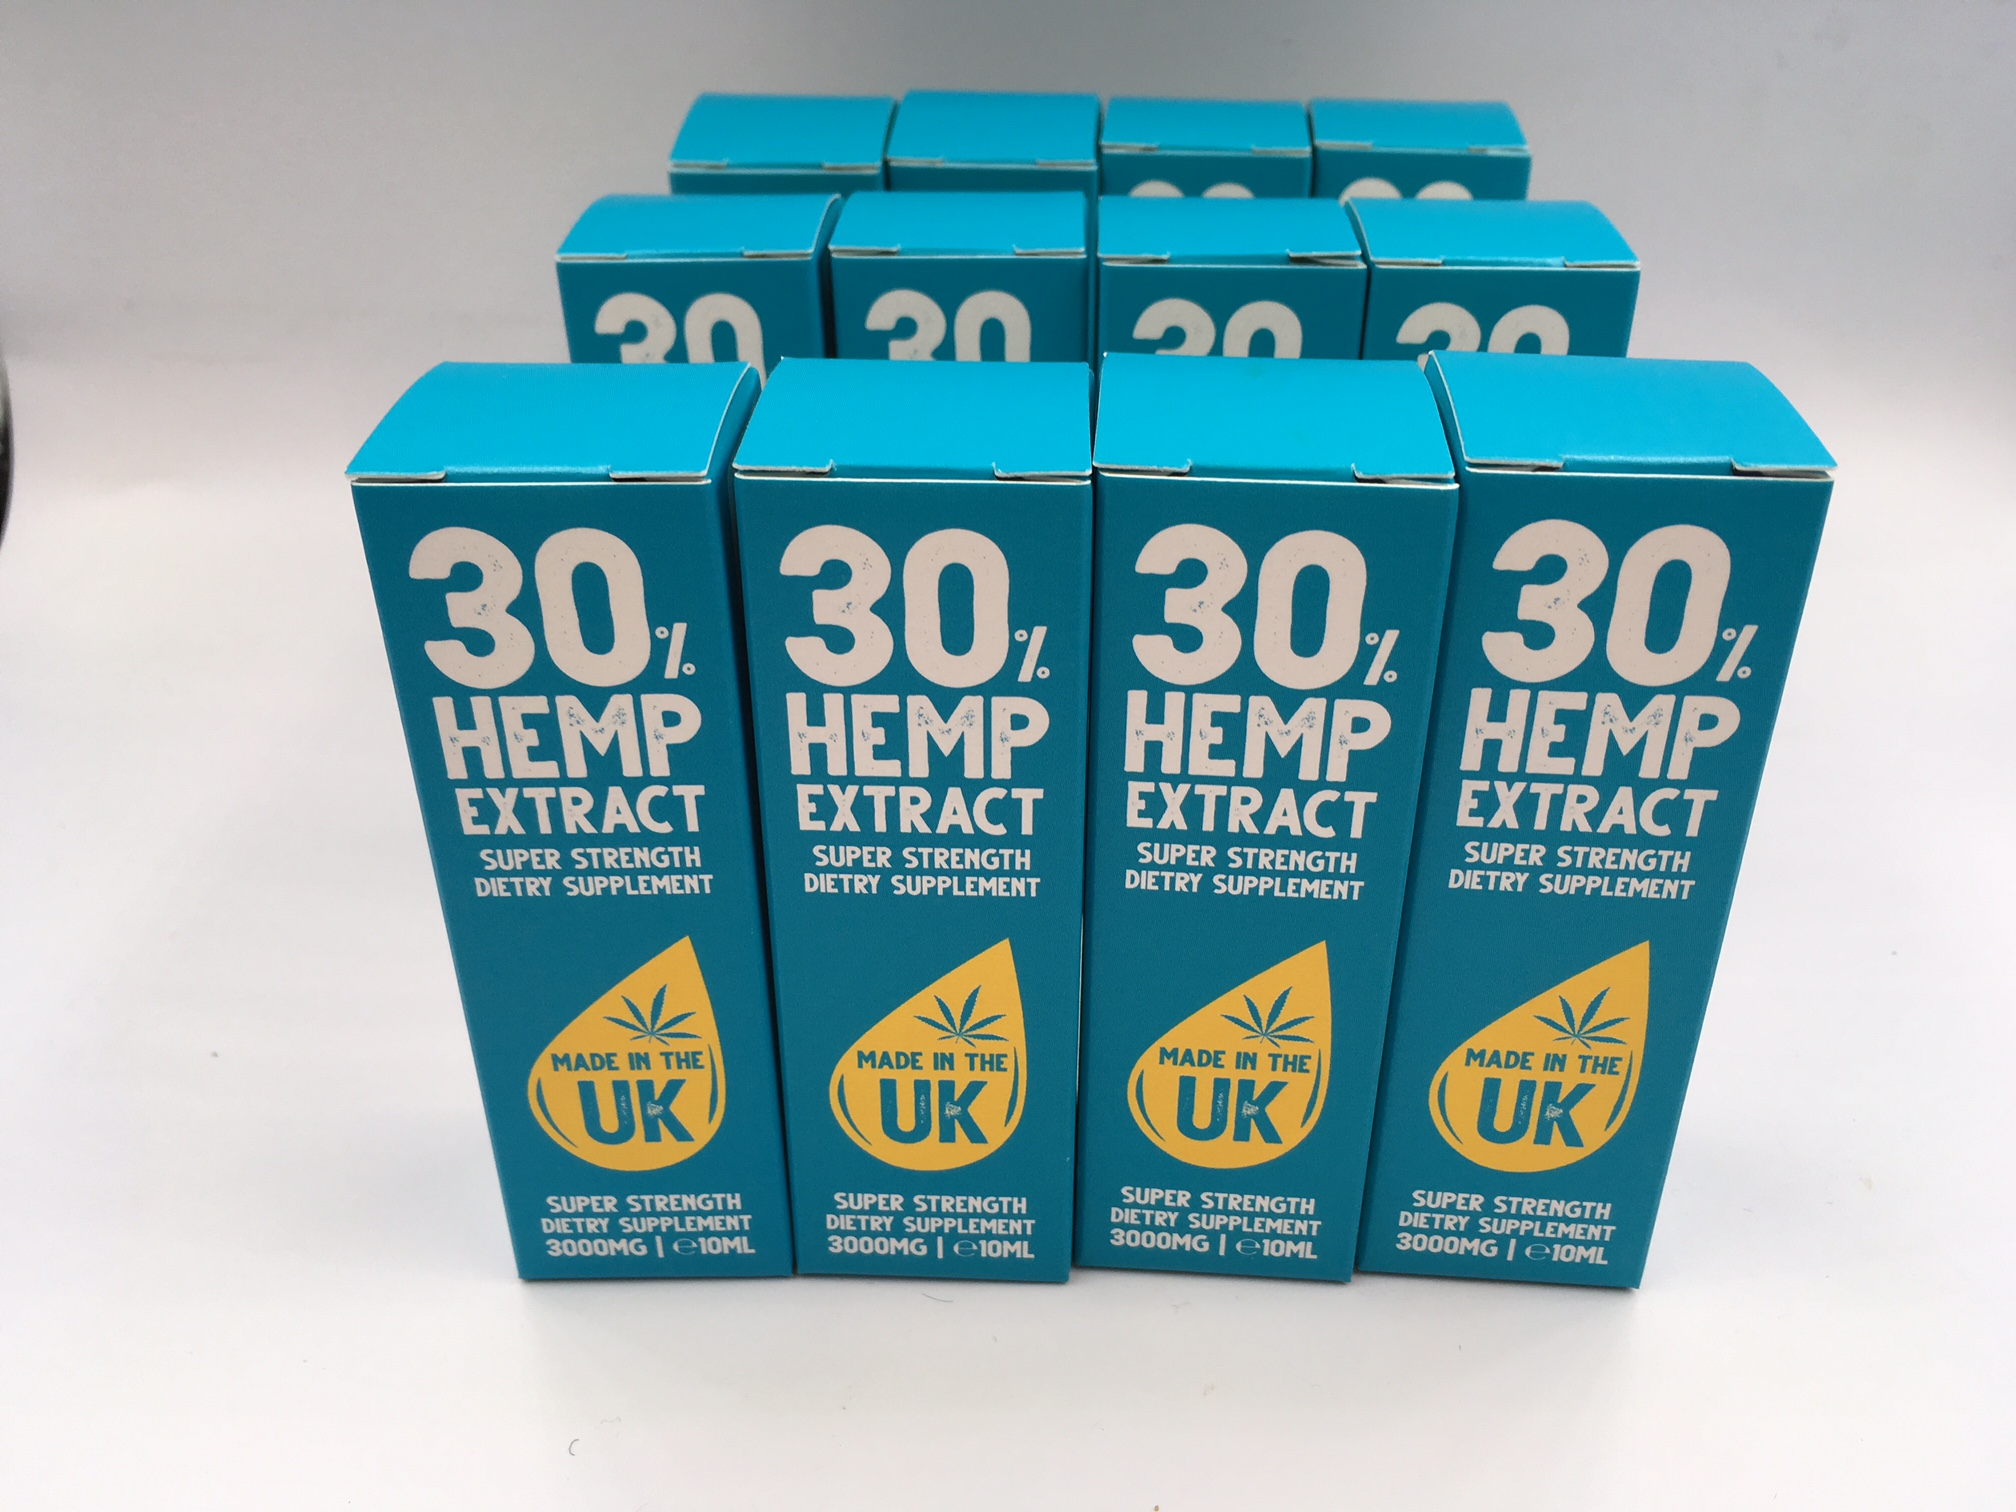 Stour Health - Hemp Oil - 30% - super strength dietary supplement - 10ml